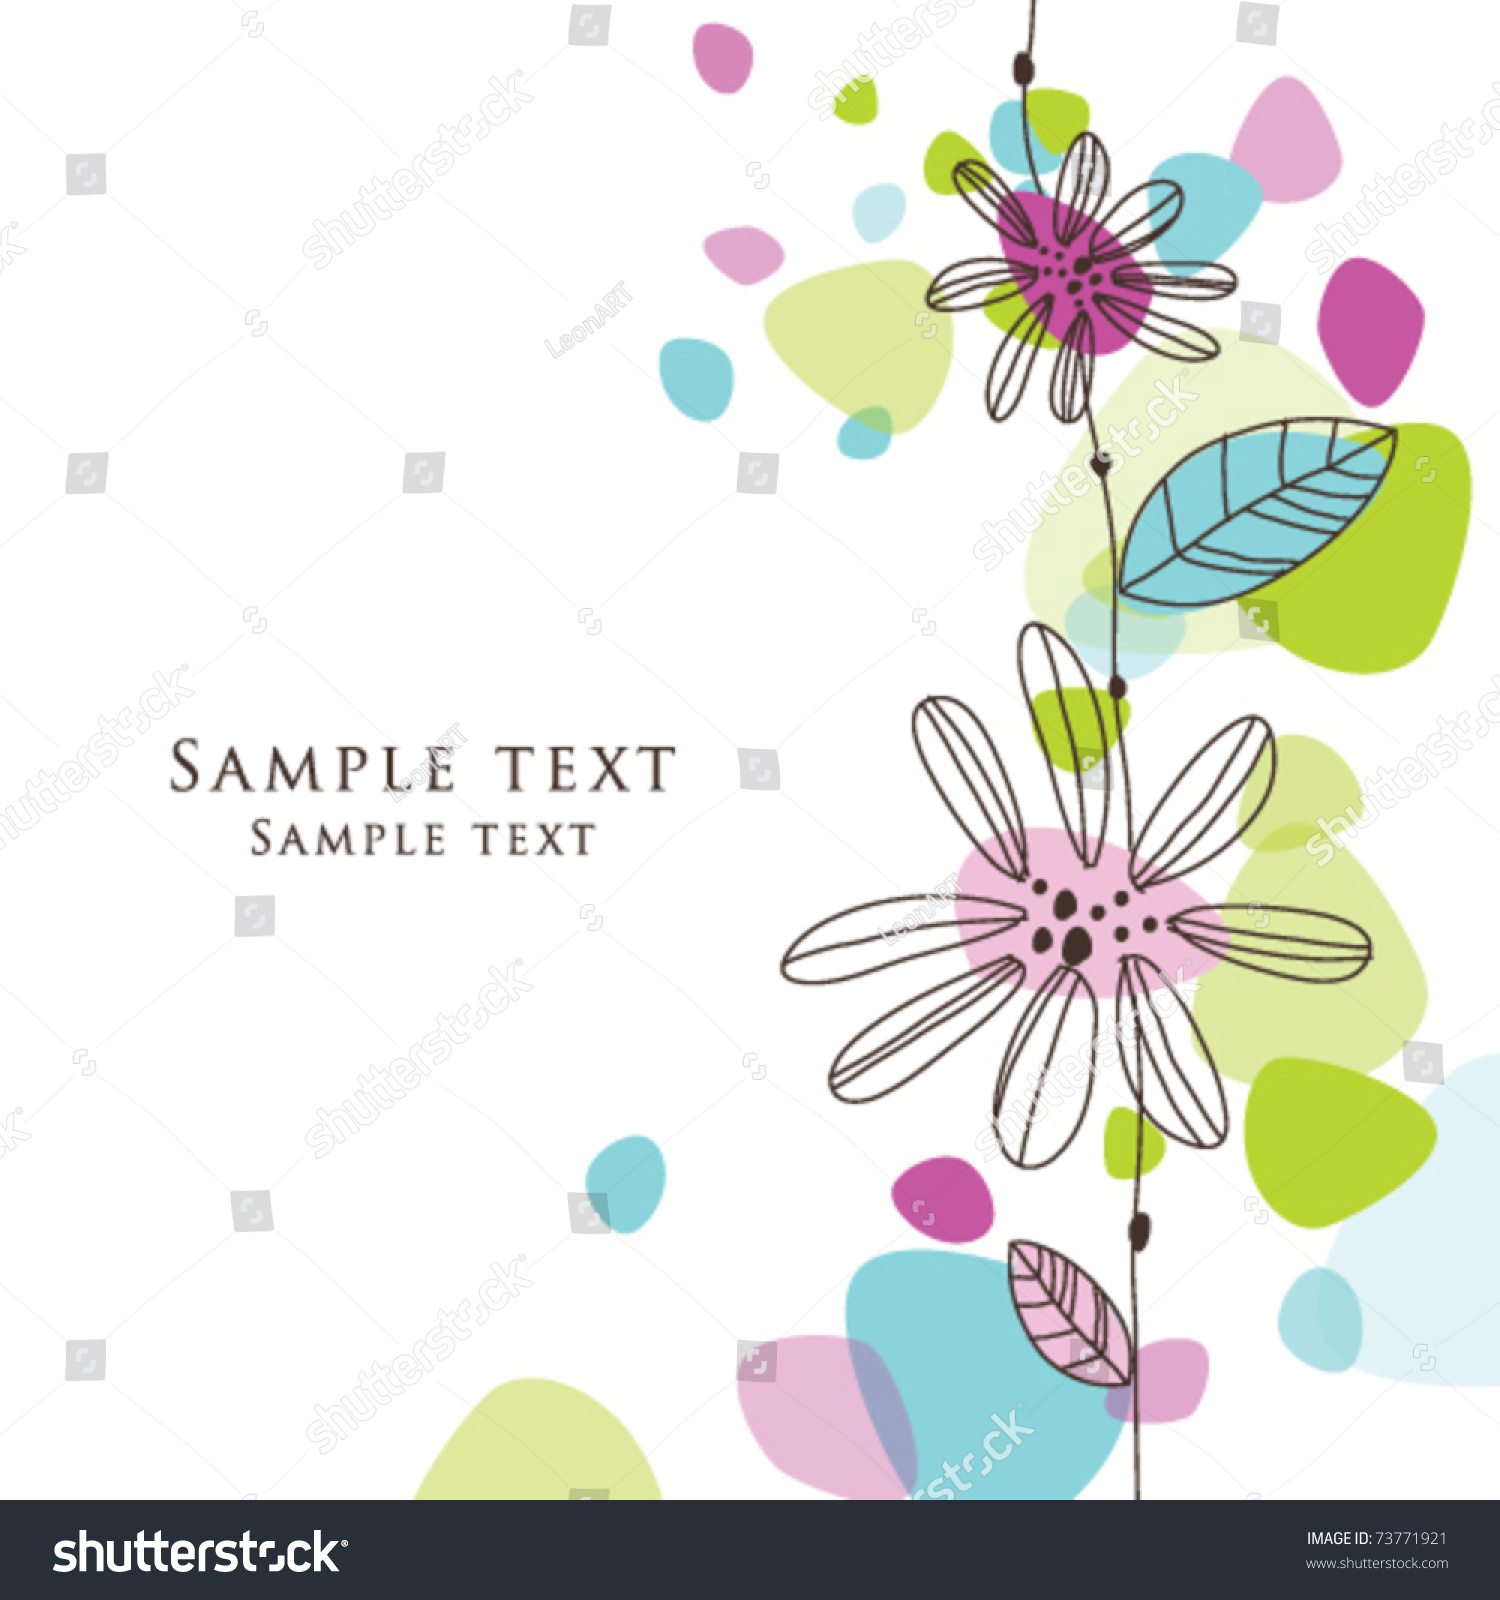 Royaltyfree Cute Birthday Greeting card with 73771921 – Cute Birthday Greeting Cards